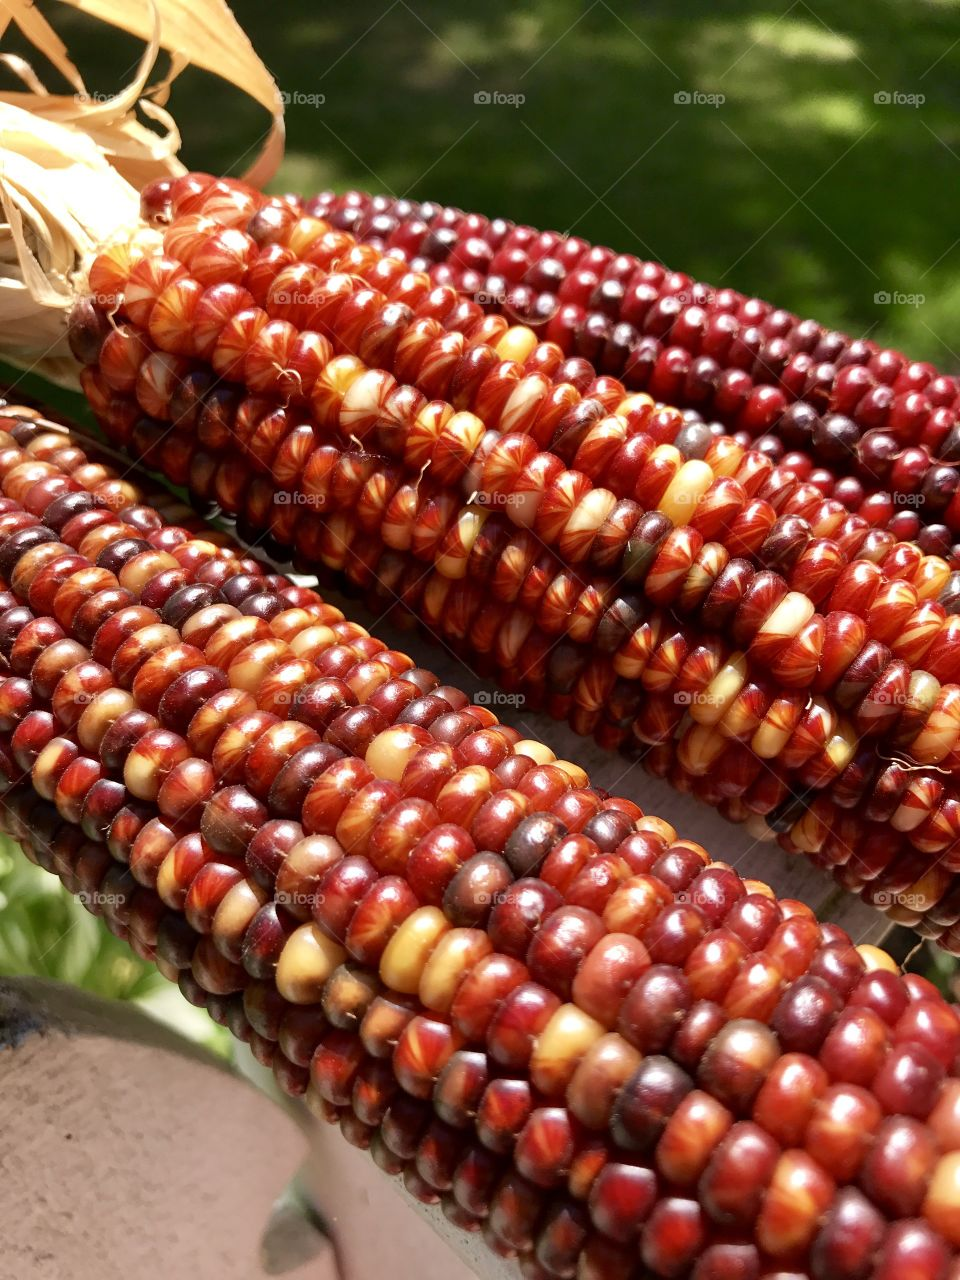 Colorful verities of corn